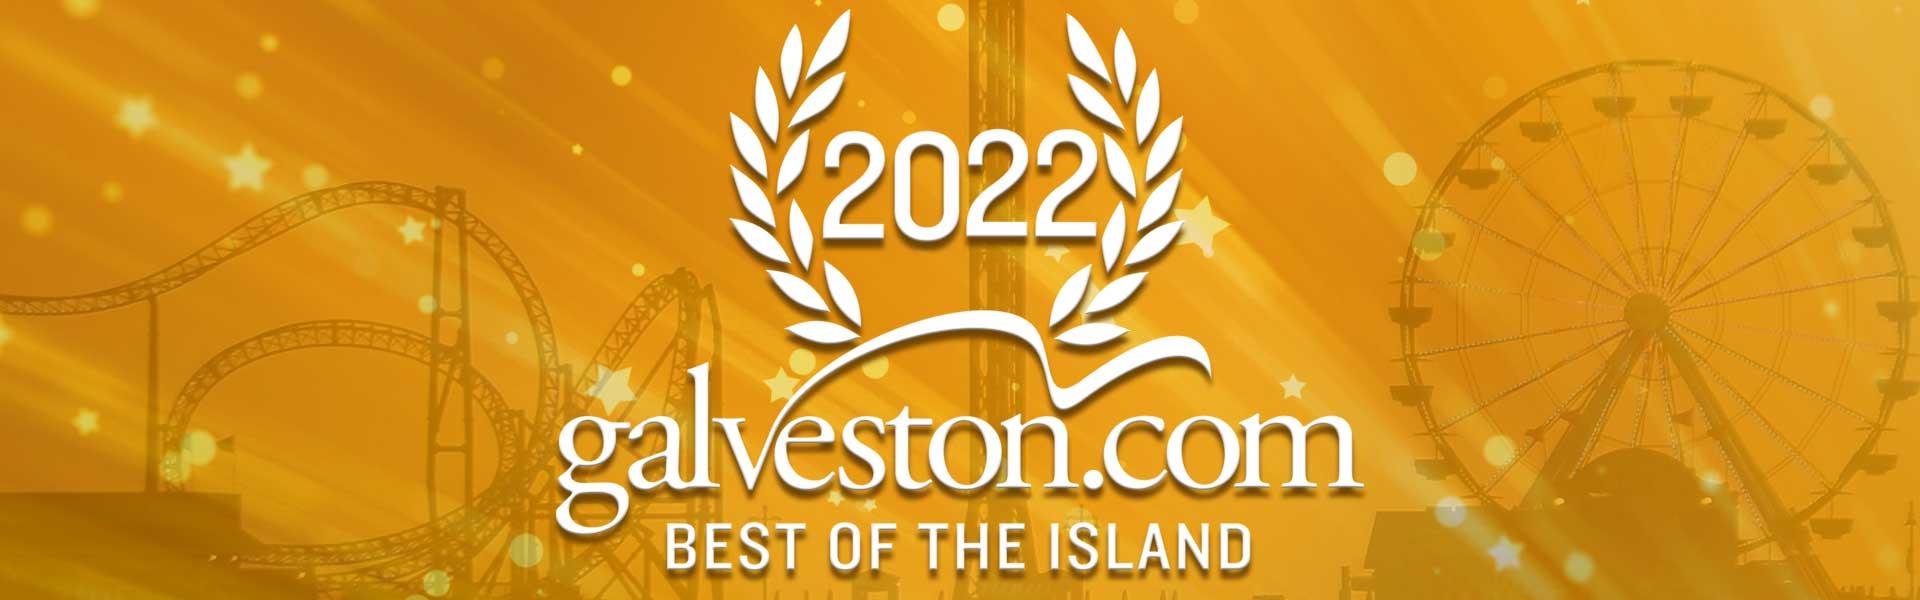 Best of the Island Awards, Galveston, TX